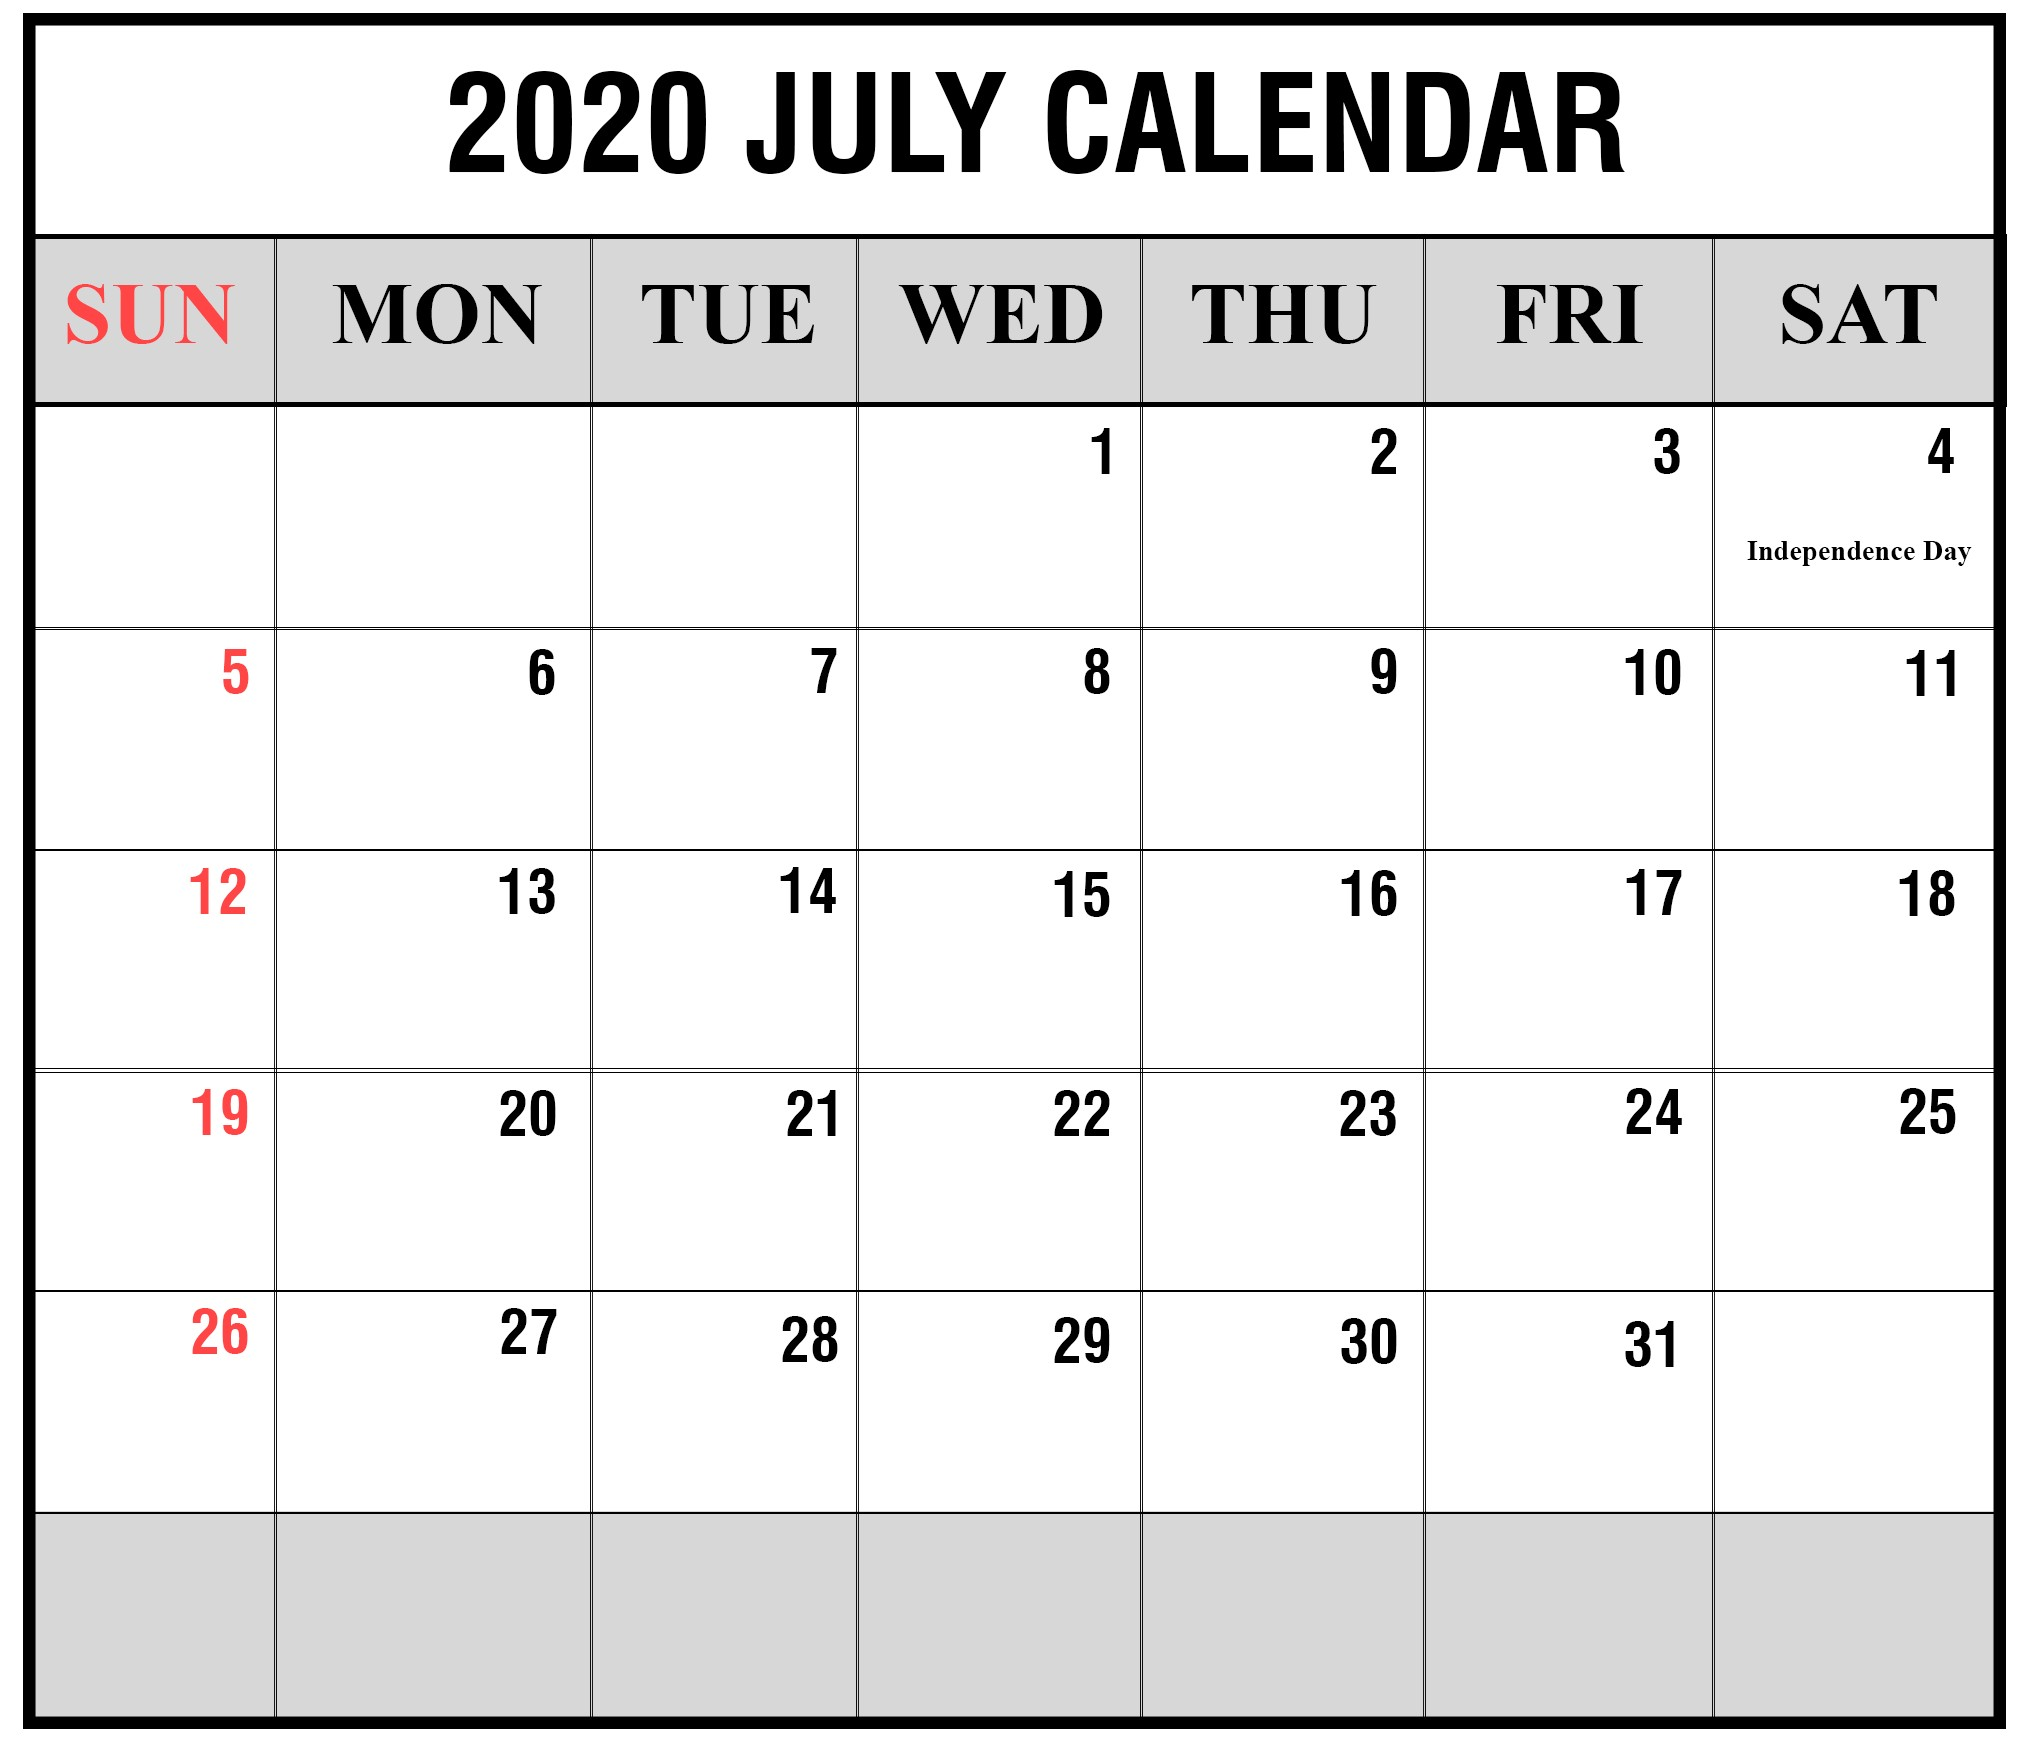 Printable 2020 Calendar Pdf Printable Yearly Calendar 2020 Template with Holidays [pdf